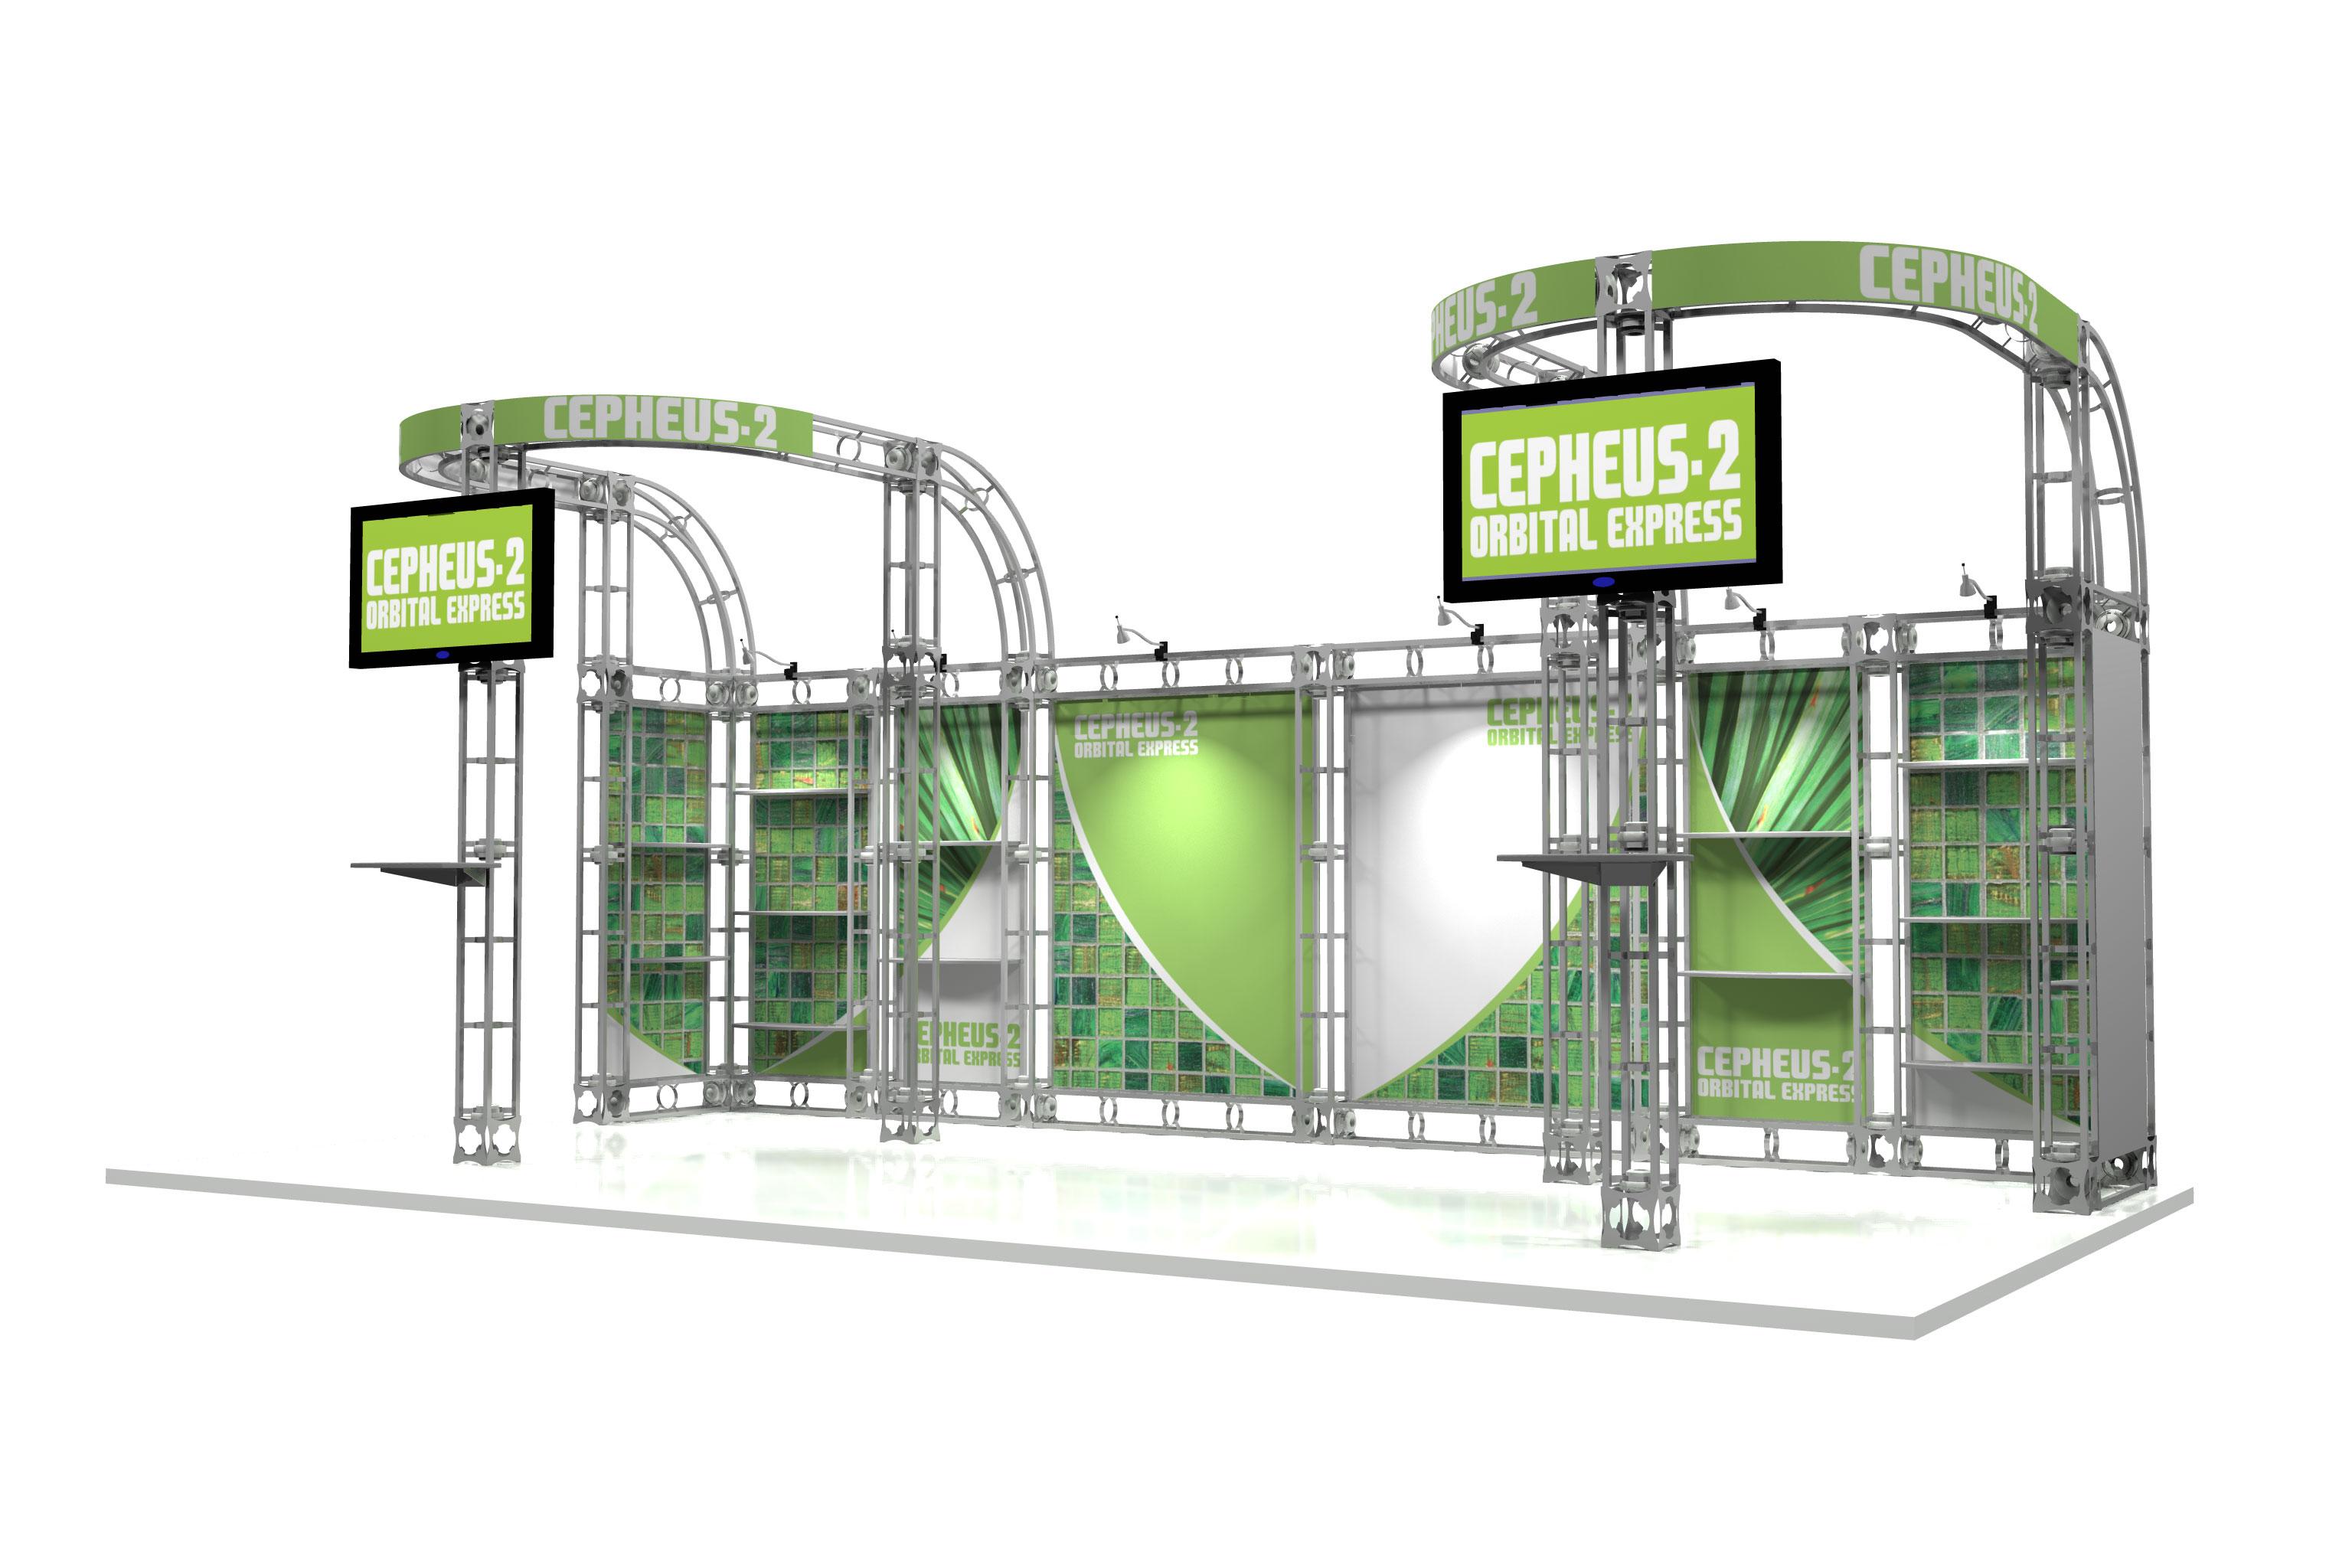 truss trade show displays